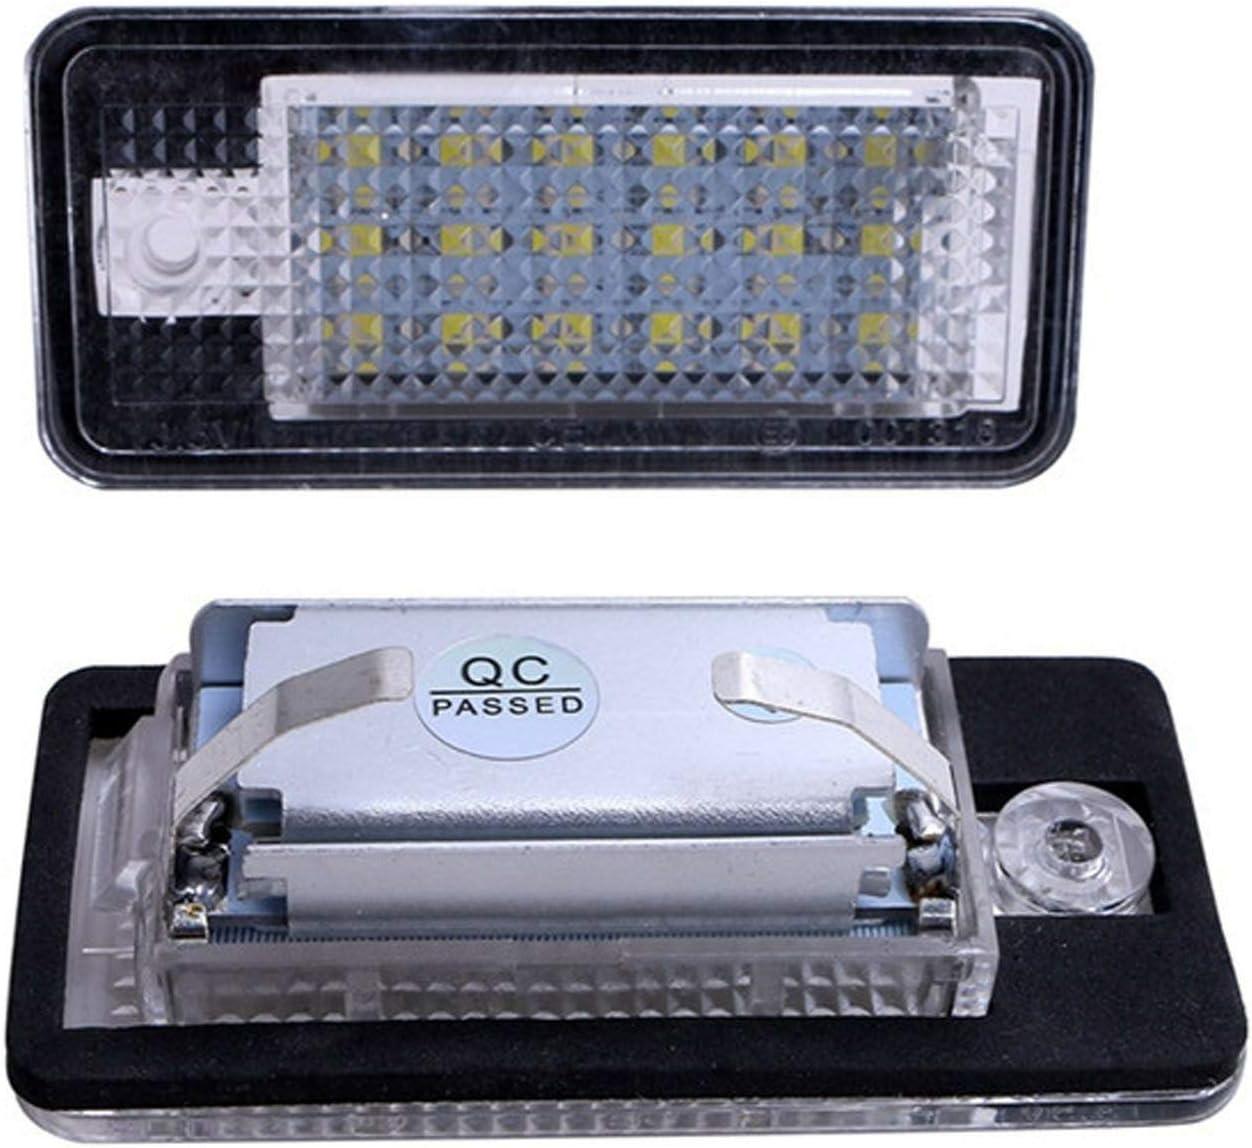 A4 RS4 A5 S3 A8 resistente al agua S4 A6 S8 Un par de luces LED para matr/ícula de repuesto para A3 l/ámpara LED 3582 SMD con CanBus sin errores Q7 C6 RS4 RS6